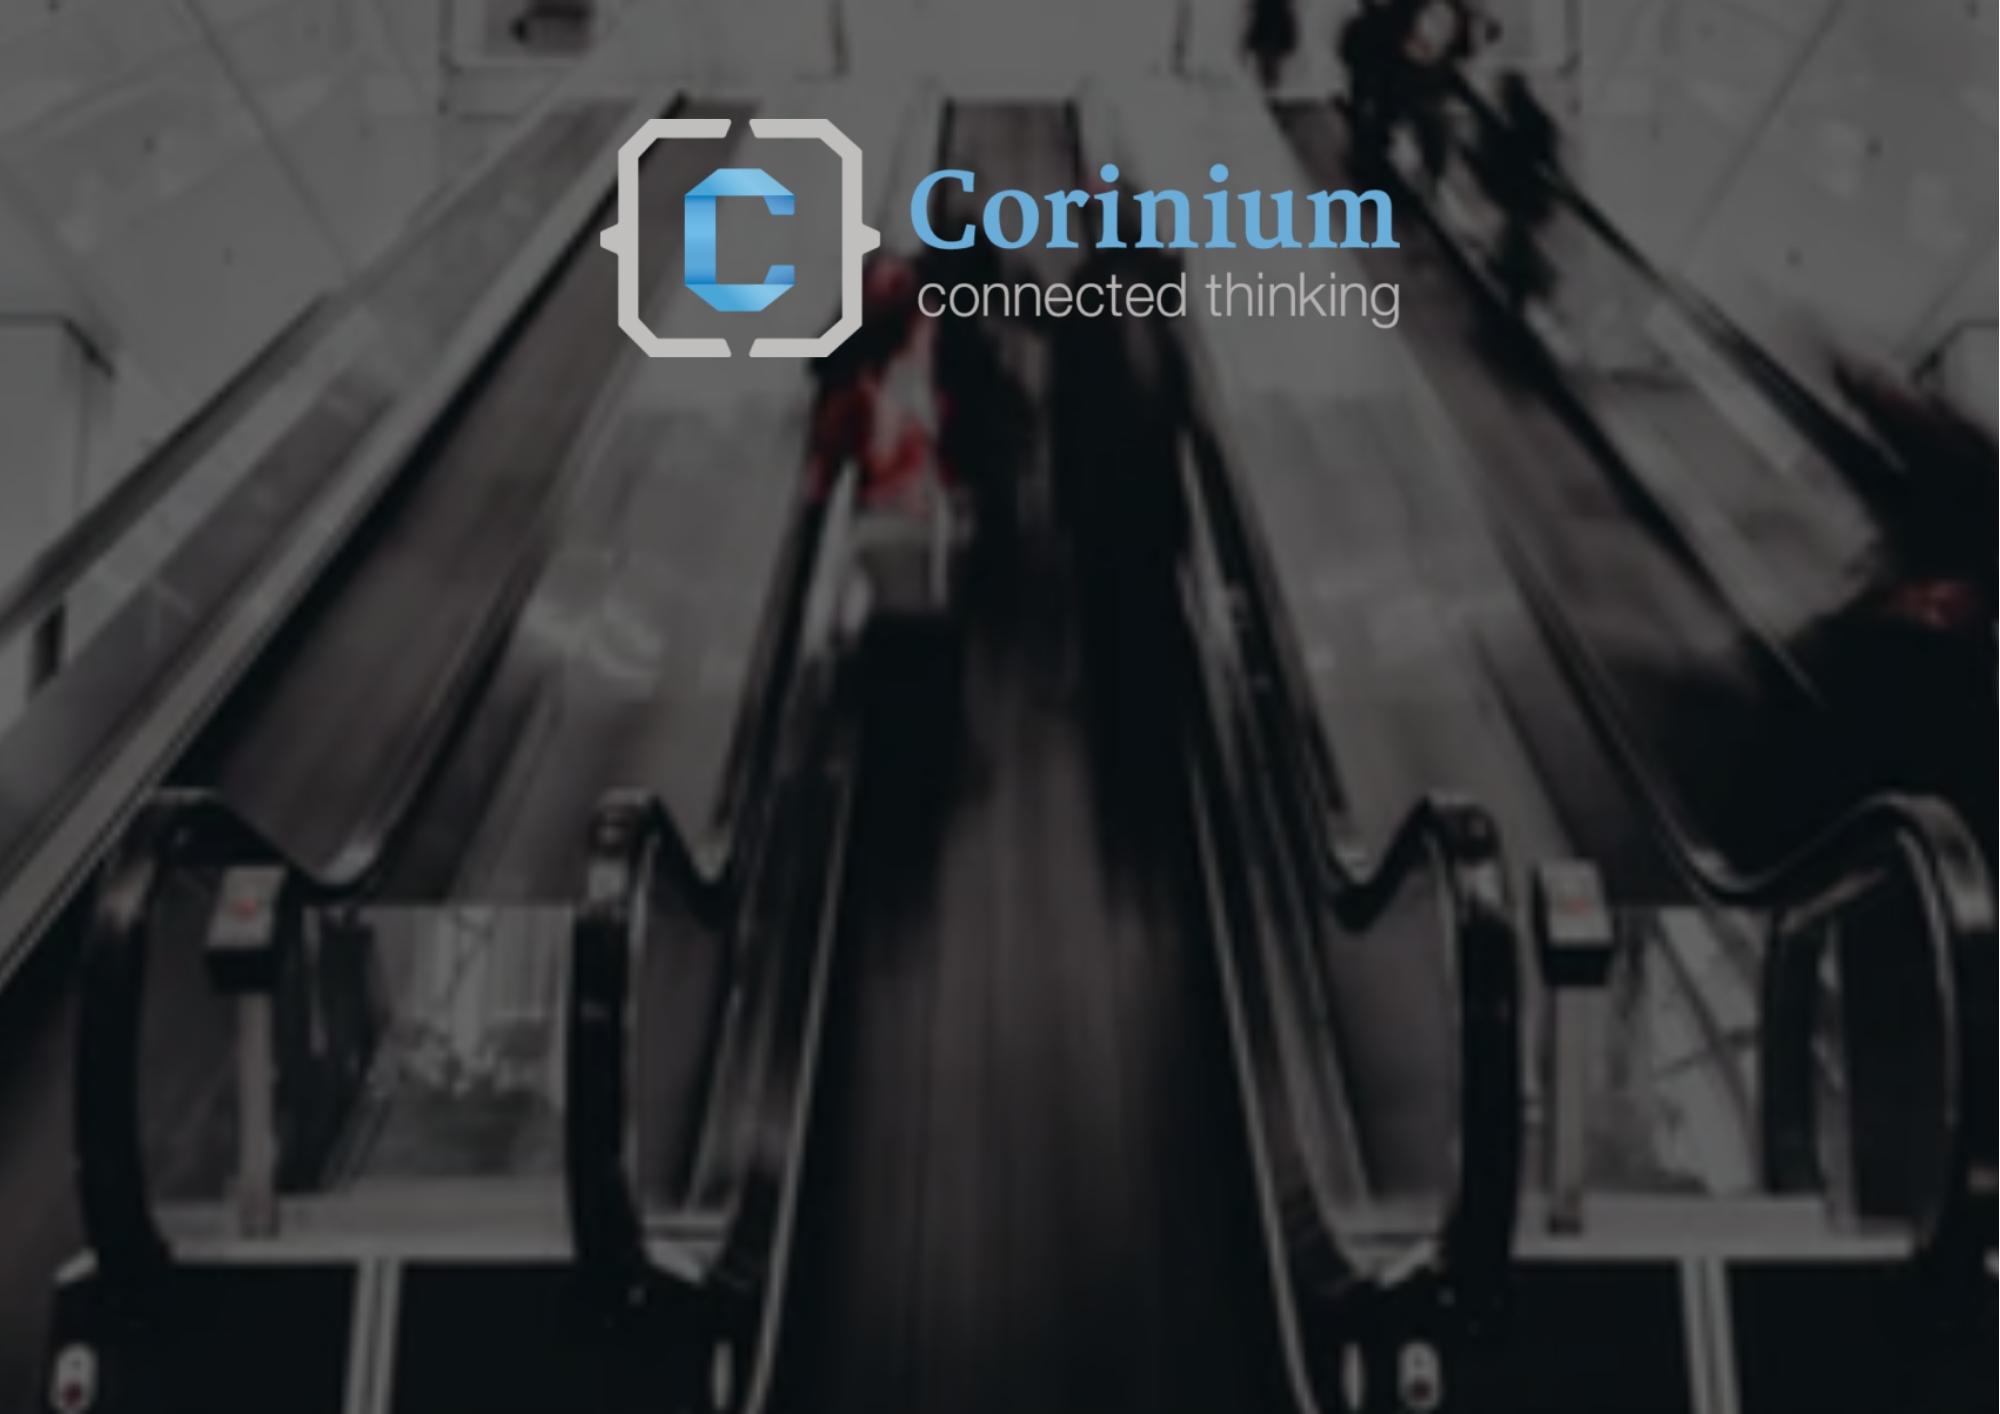 website event listing images - CCO